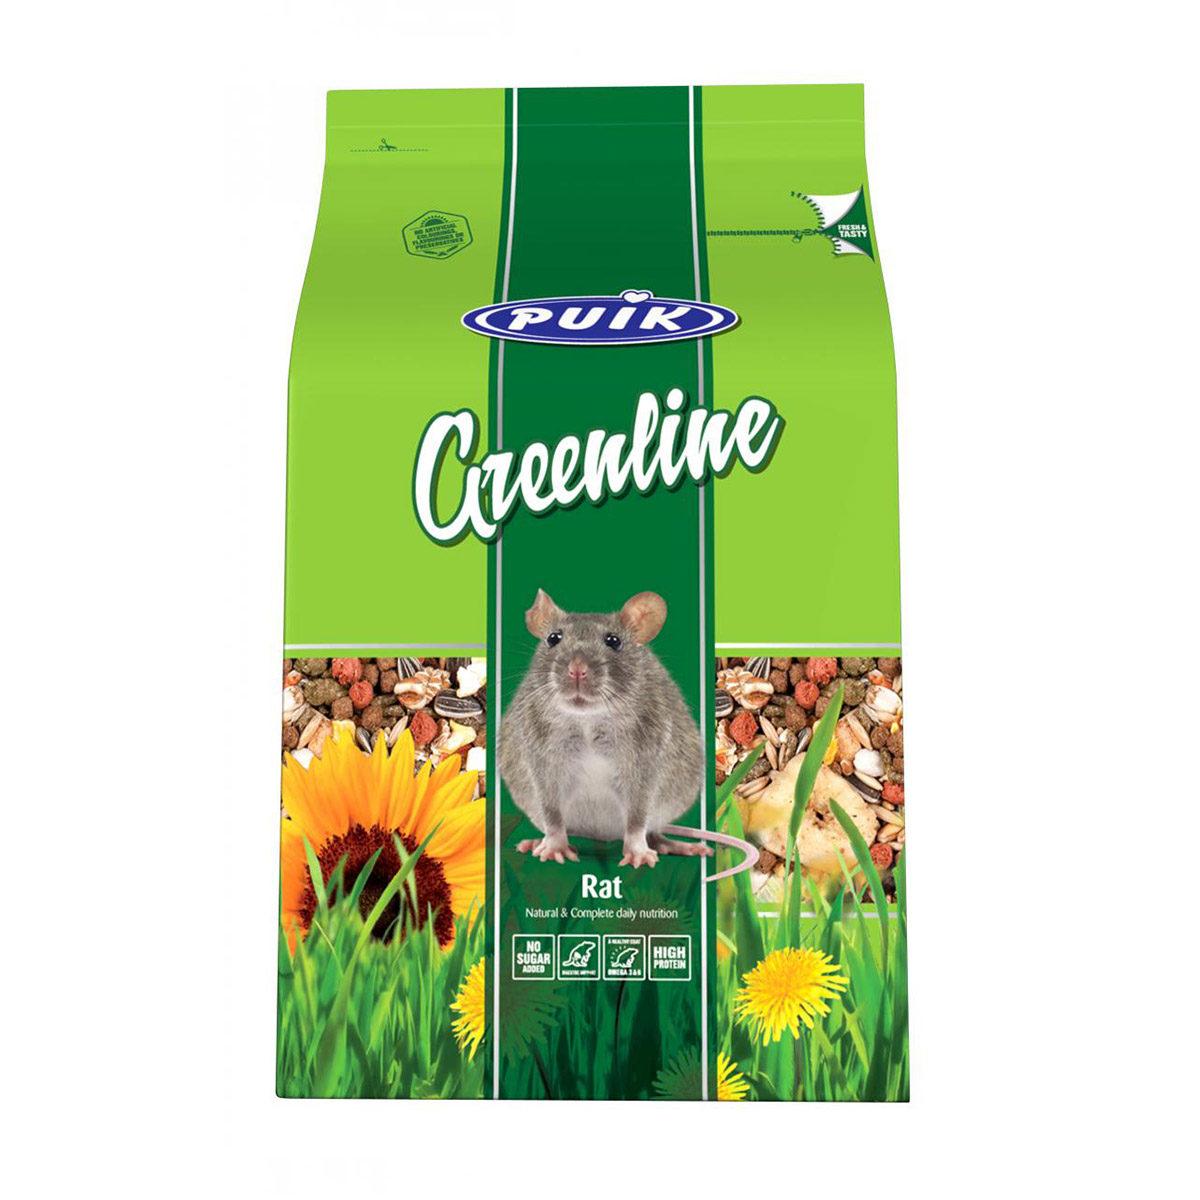 Puik Greenline Rattenvoer 800 gr